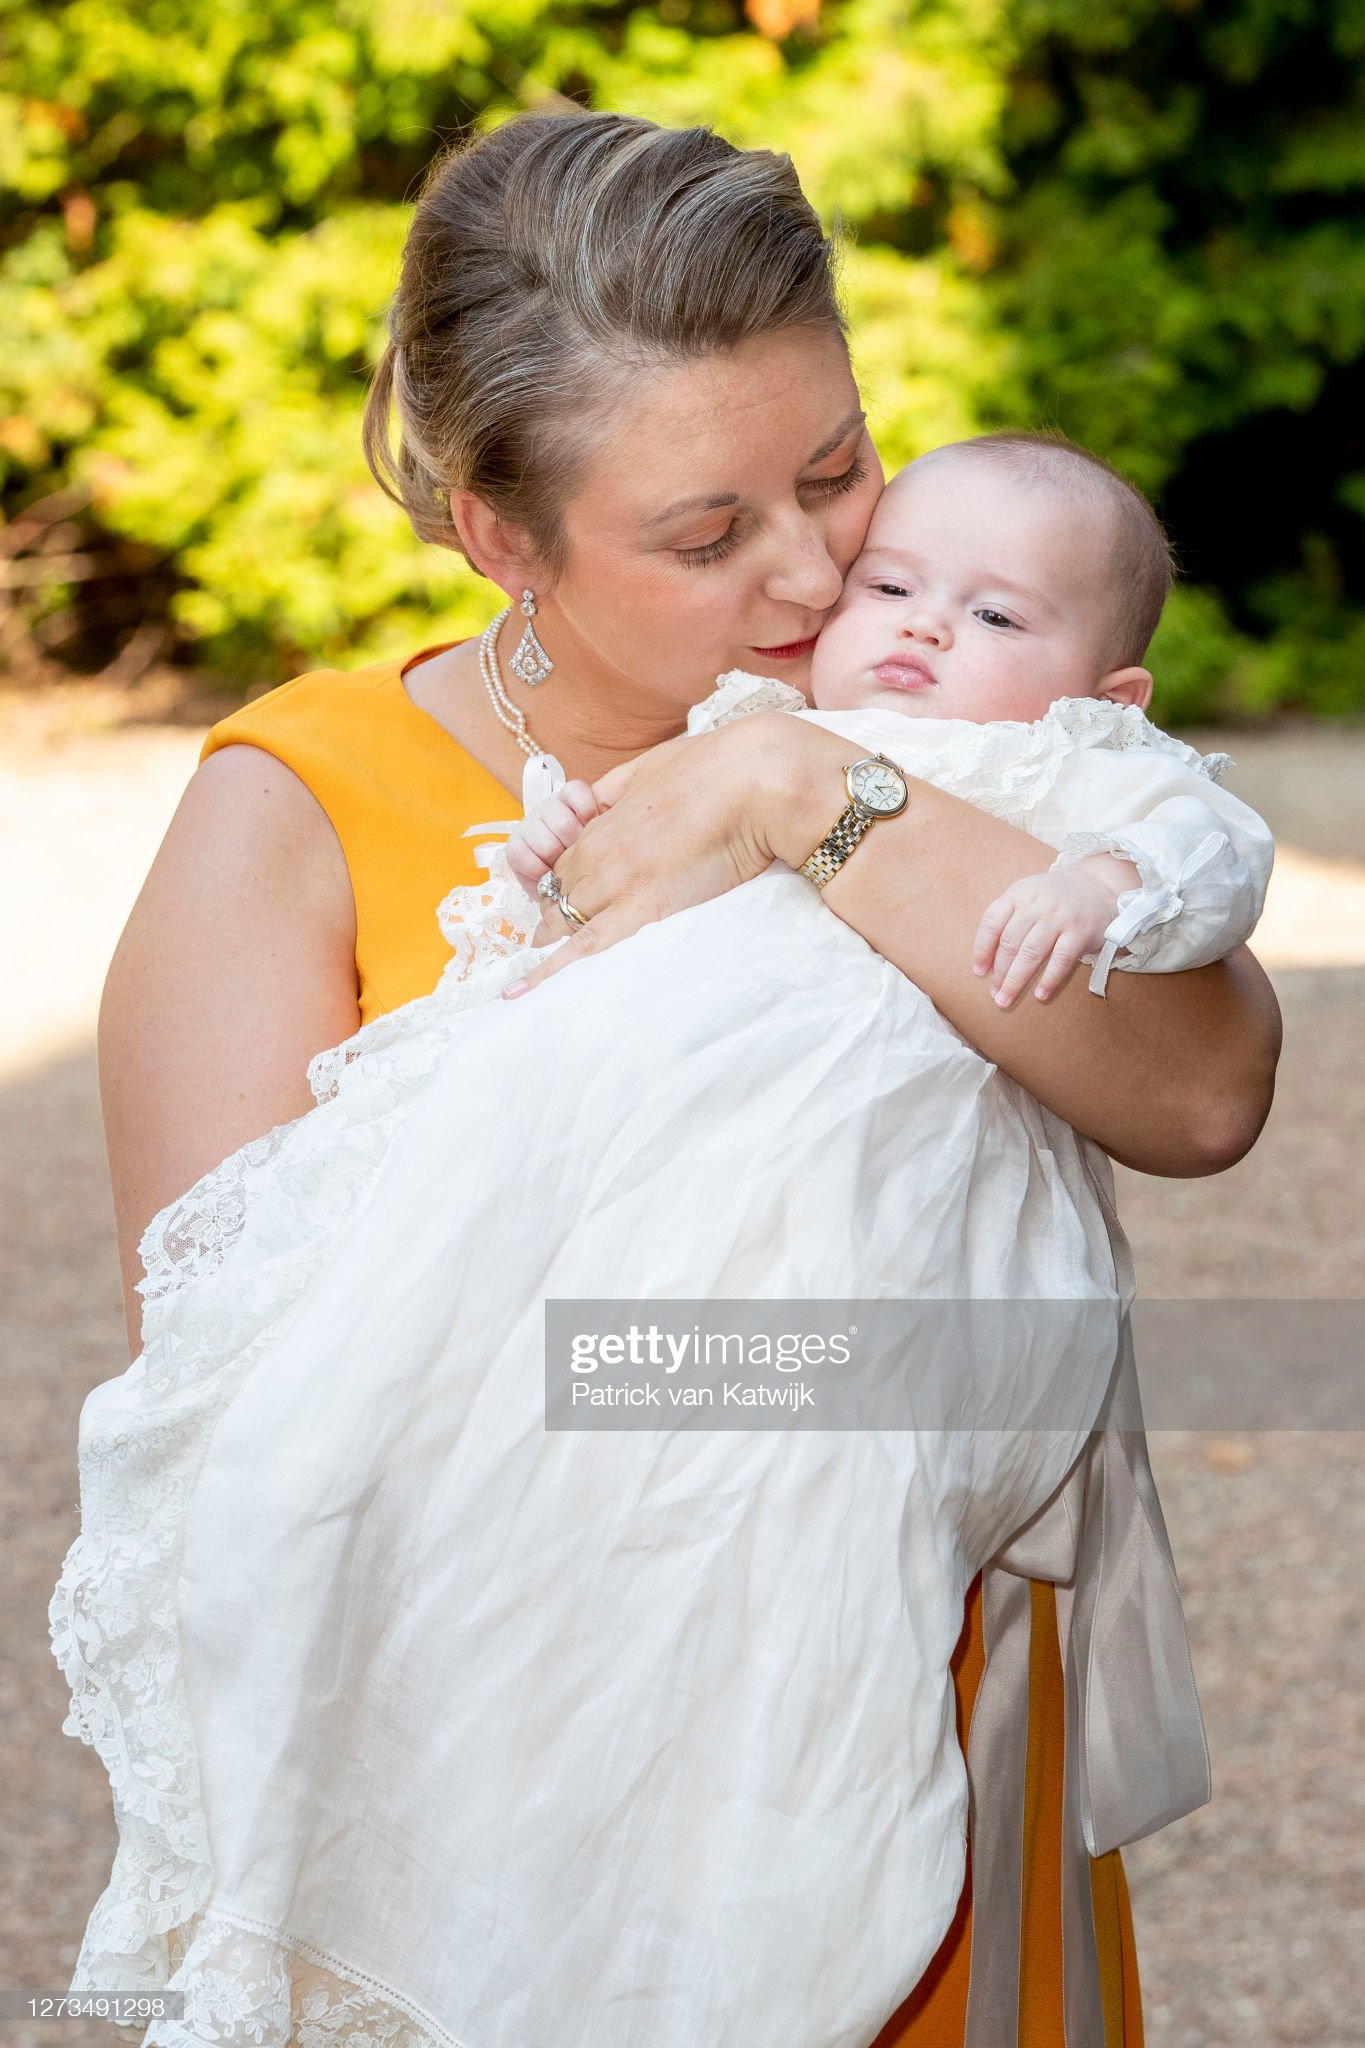 hereditary-grand-duke-guillaume-of-luxembourg-and-hereditary-grand-picture-id1273491298